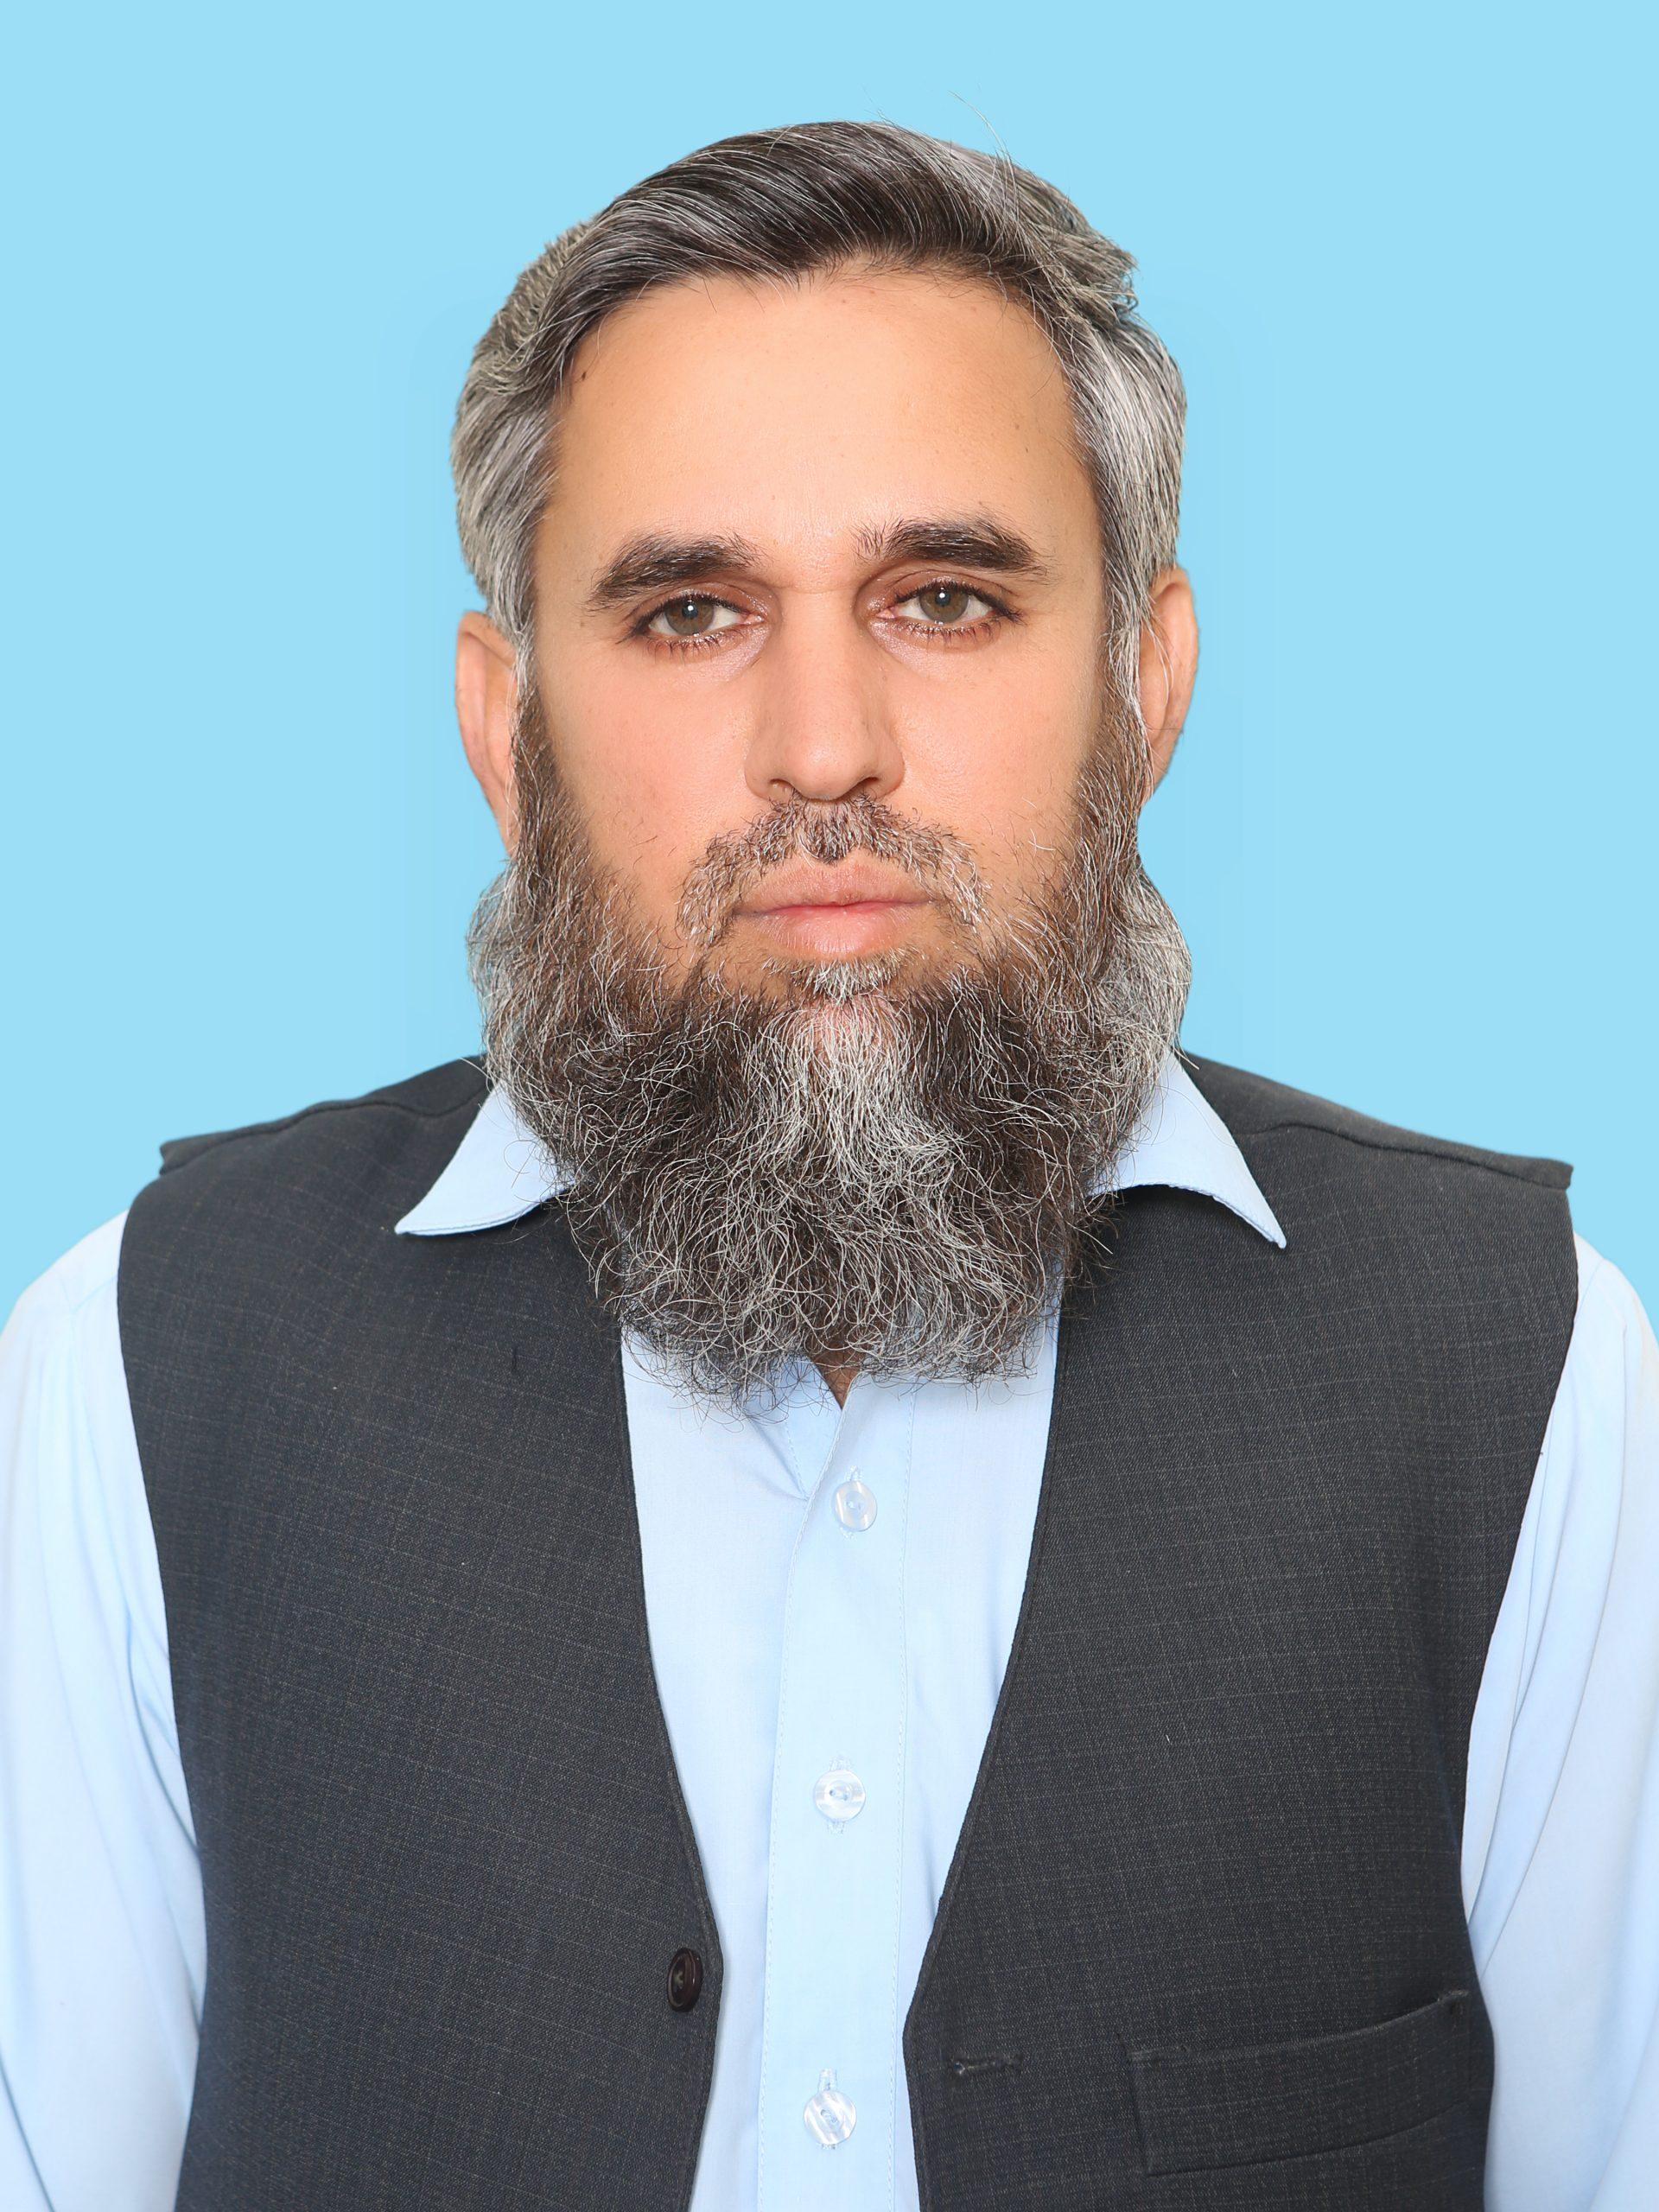 Dr. Gulzar Khan